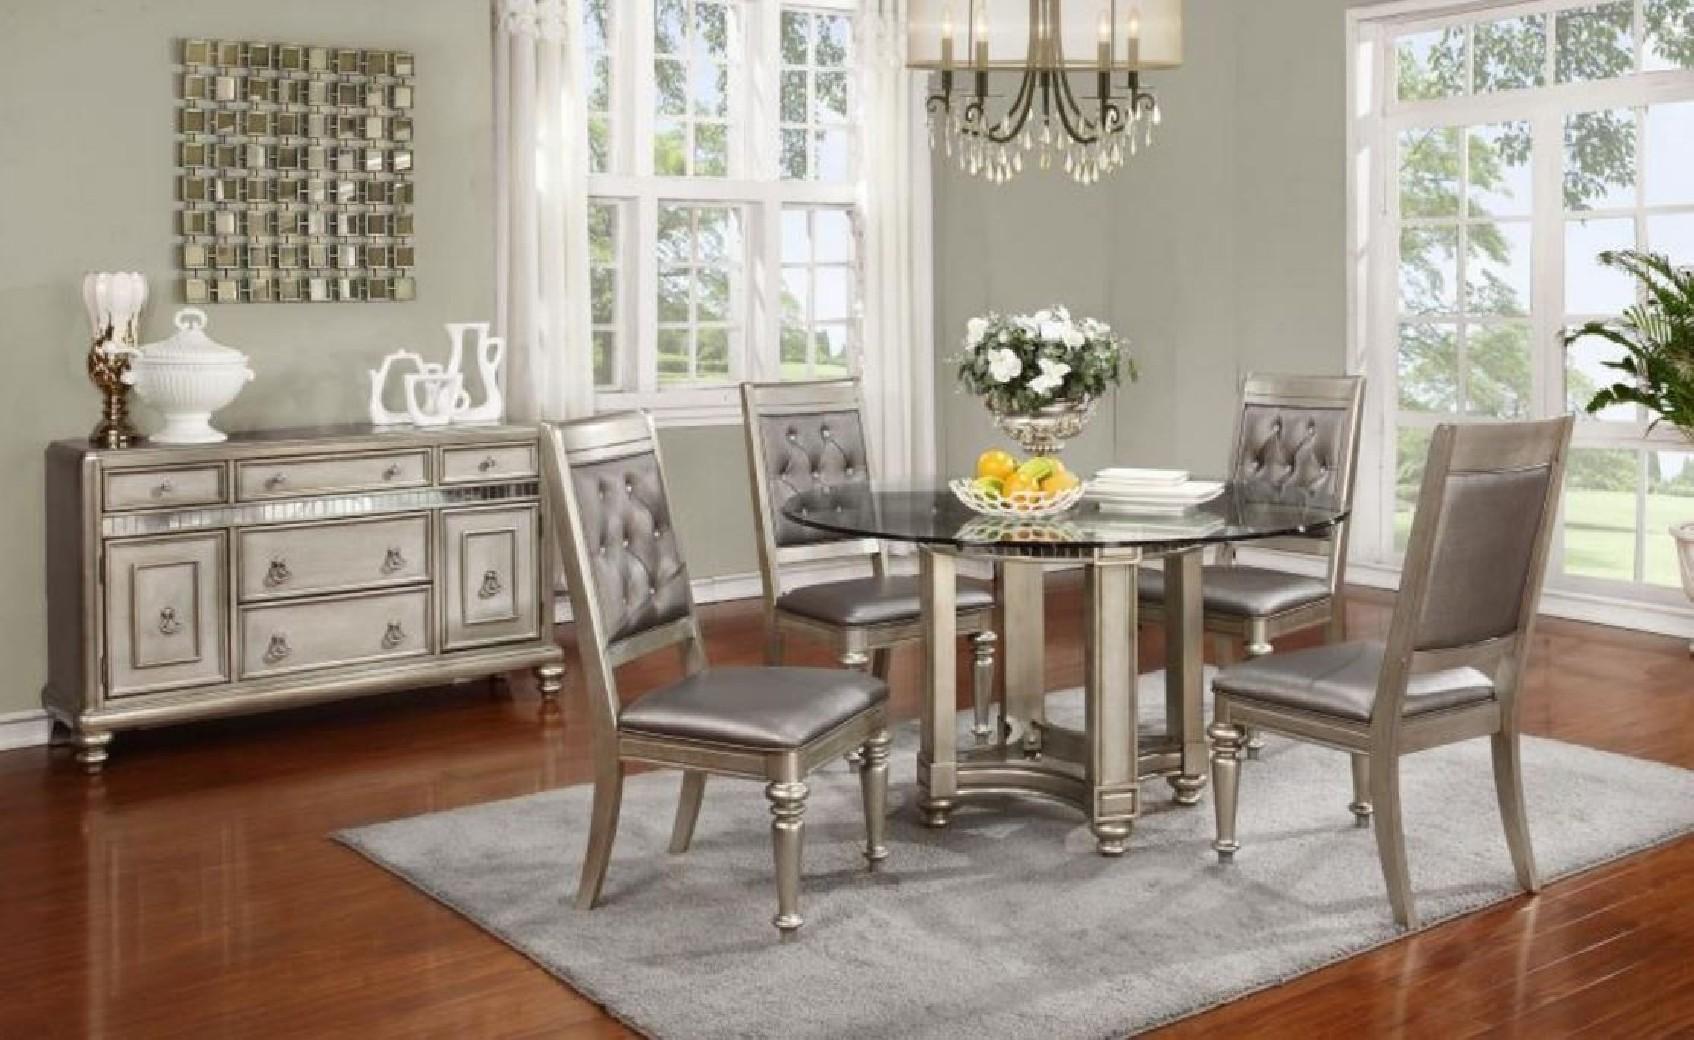 106470 bling game metallic dining set round table glass top